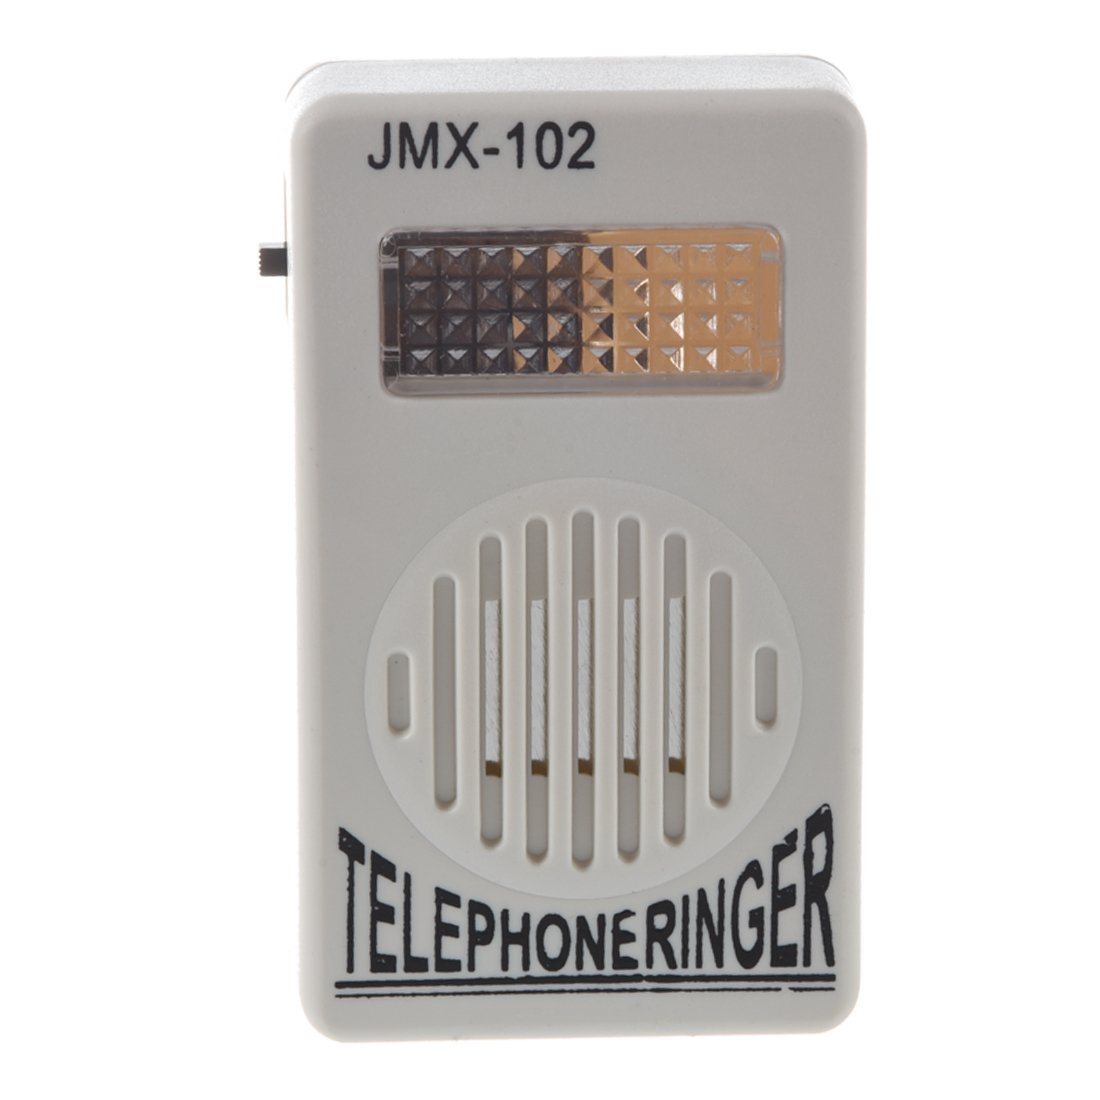 TOOGOO(R) RJ11 Socket Loud Telephone Ring Speaker Ringtone Amplifier